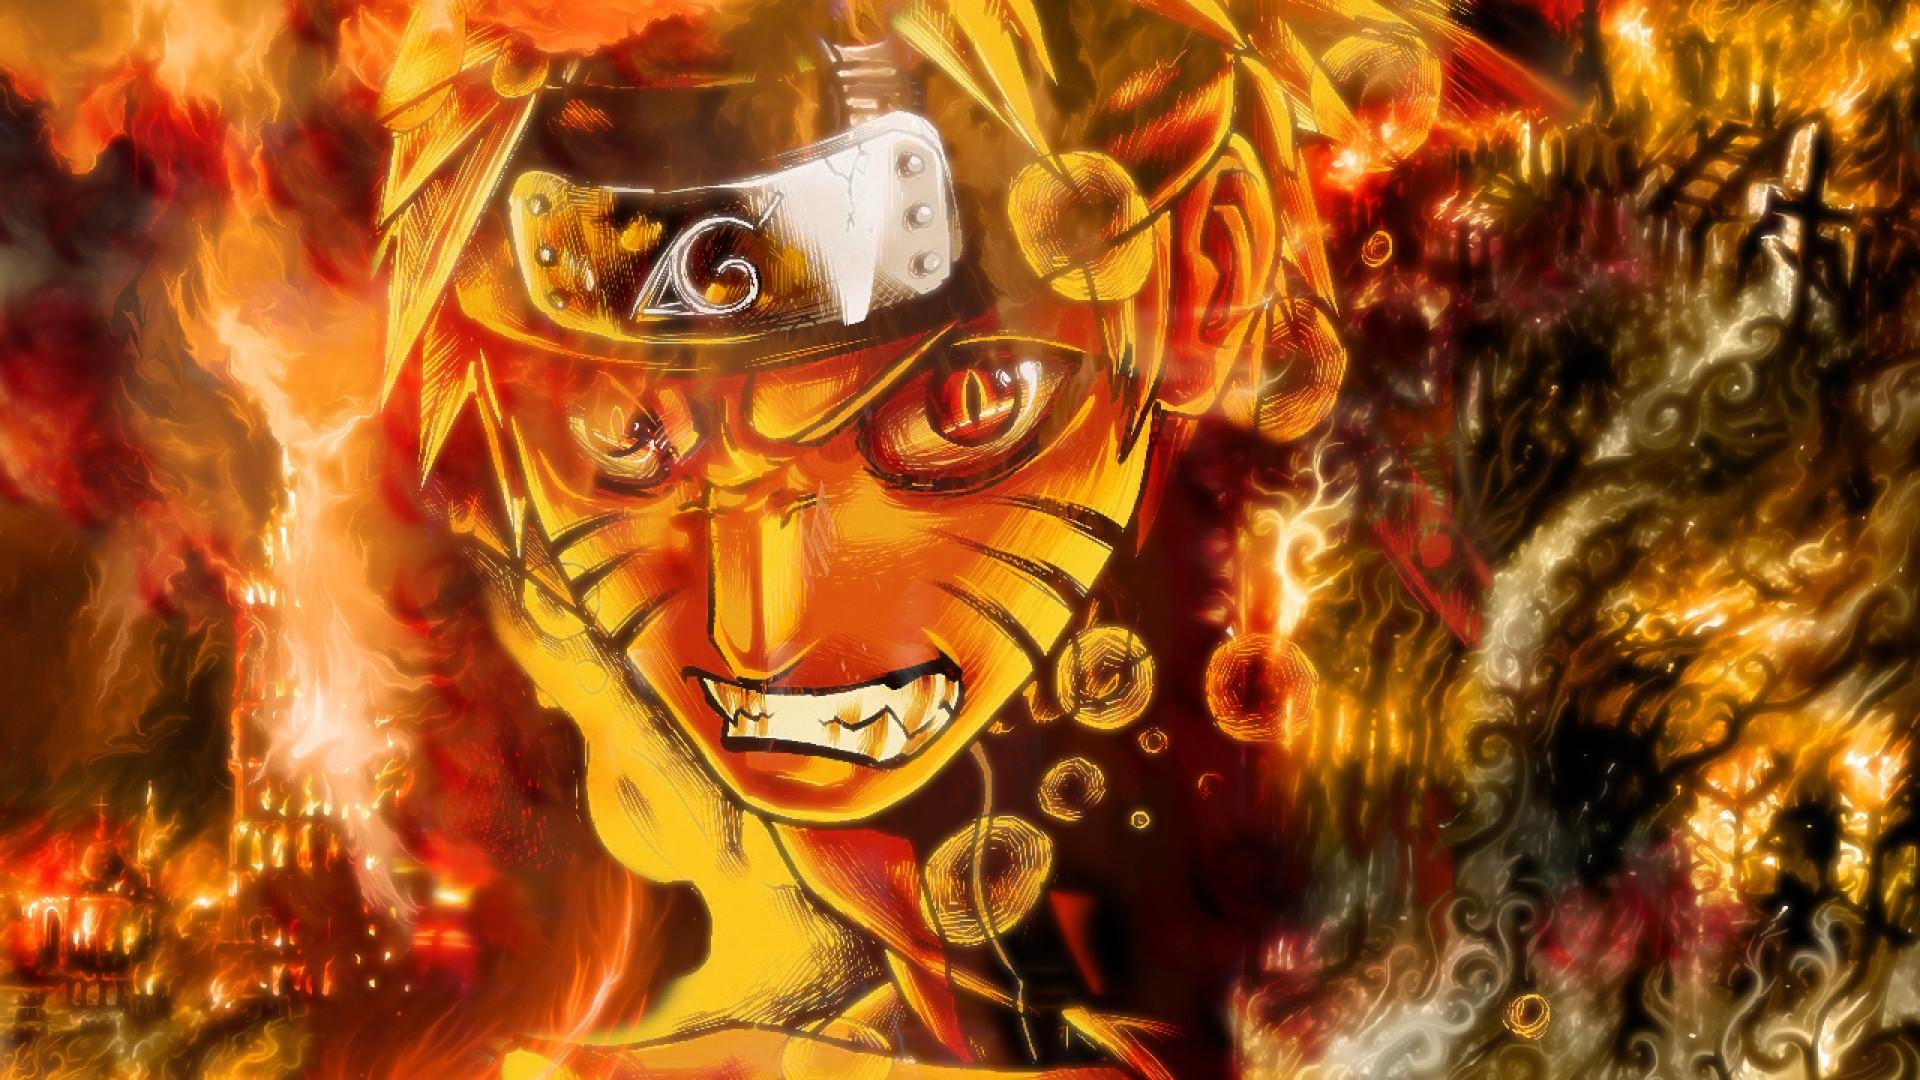 49 Naruto Wallpapers Download On Wallpapersafari